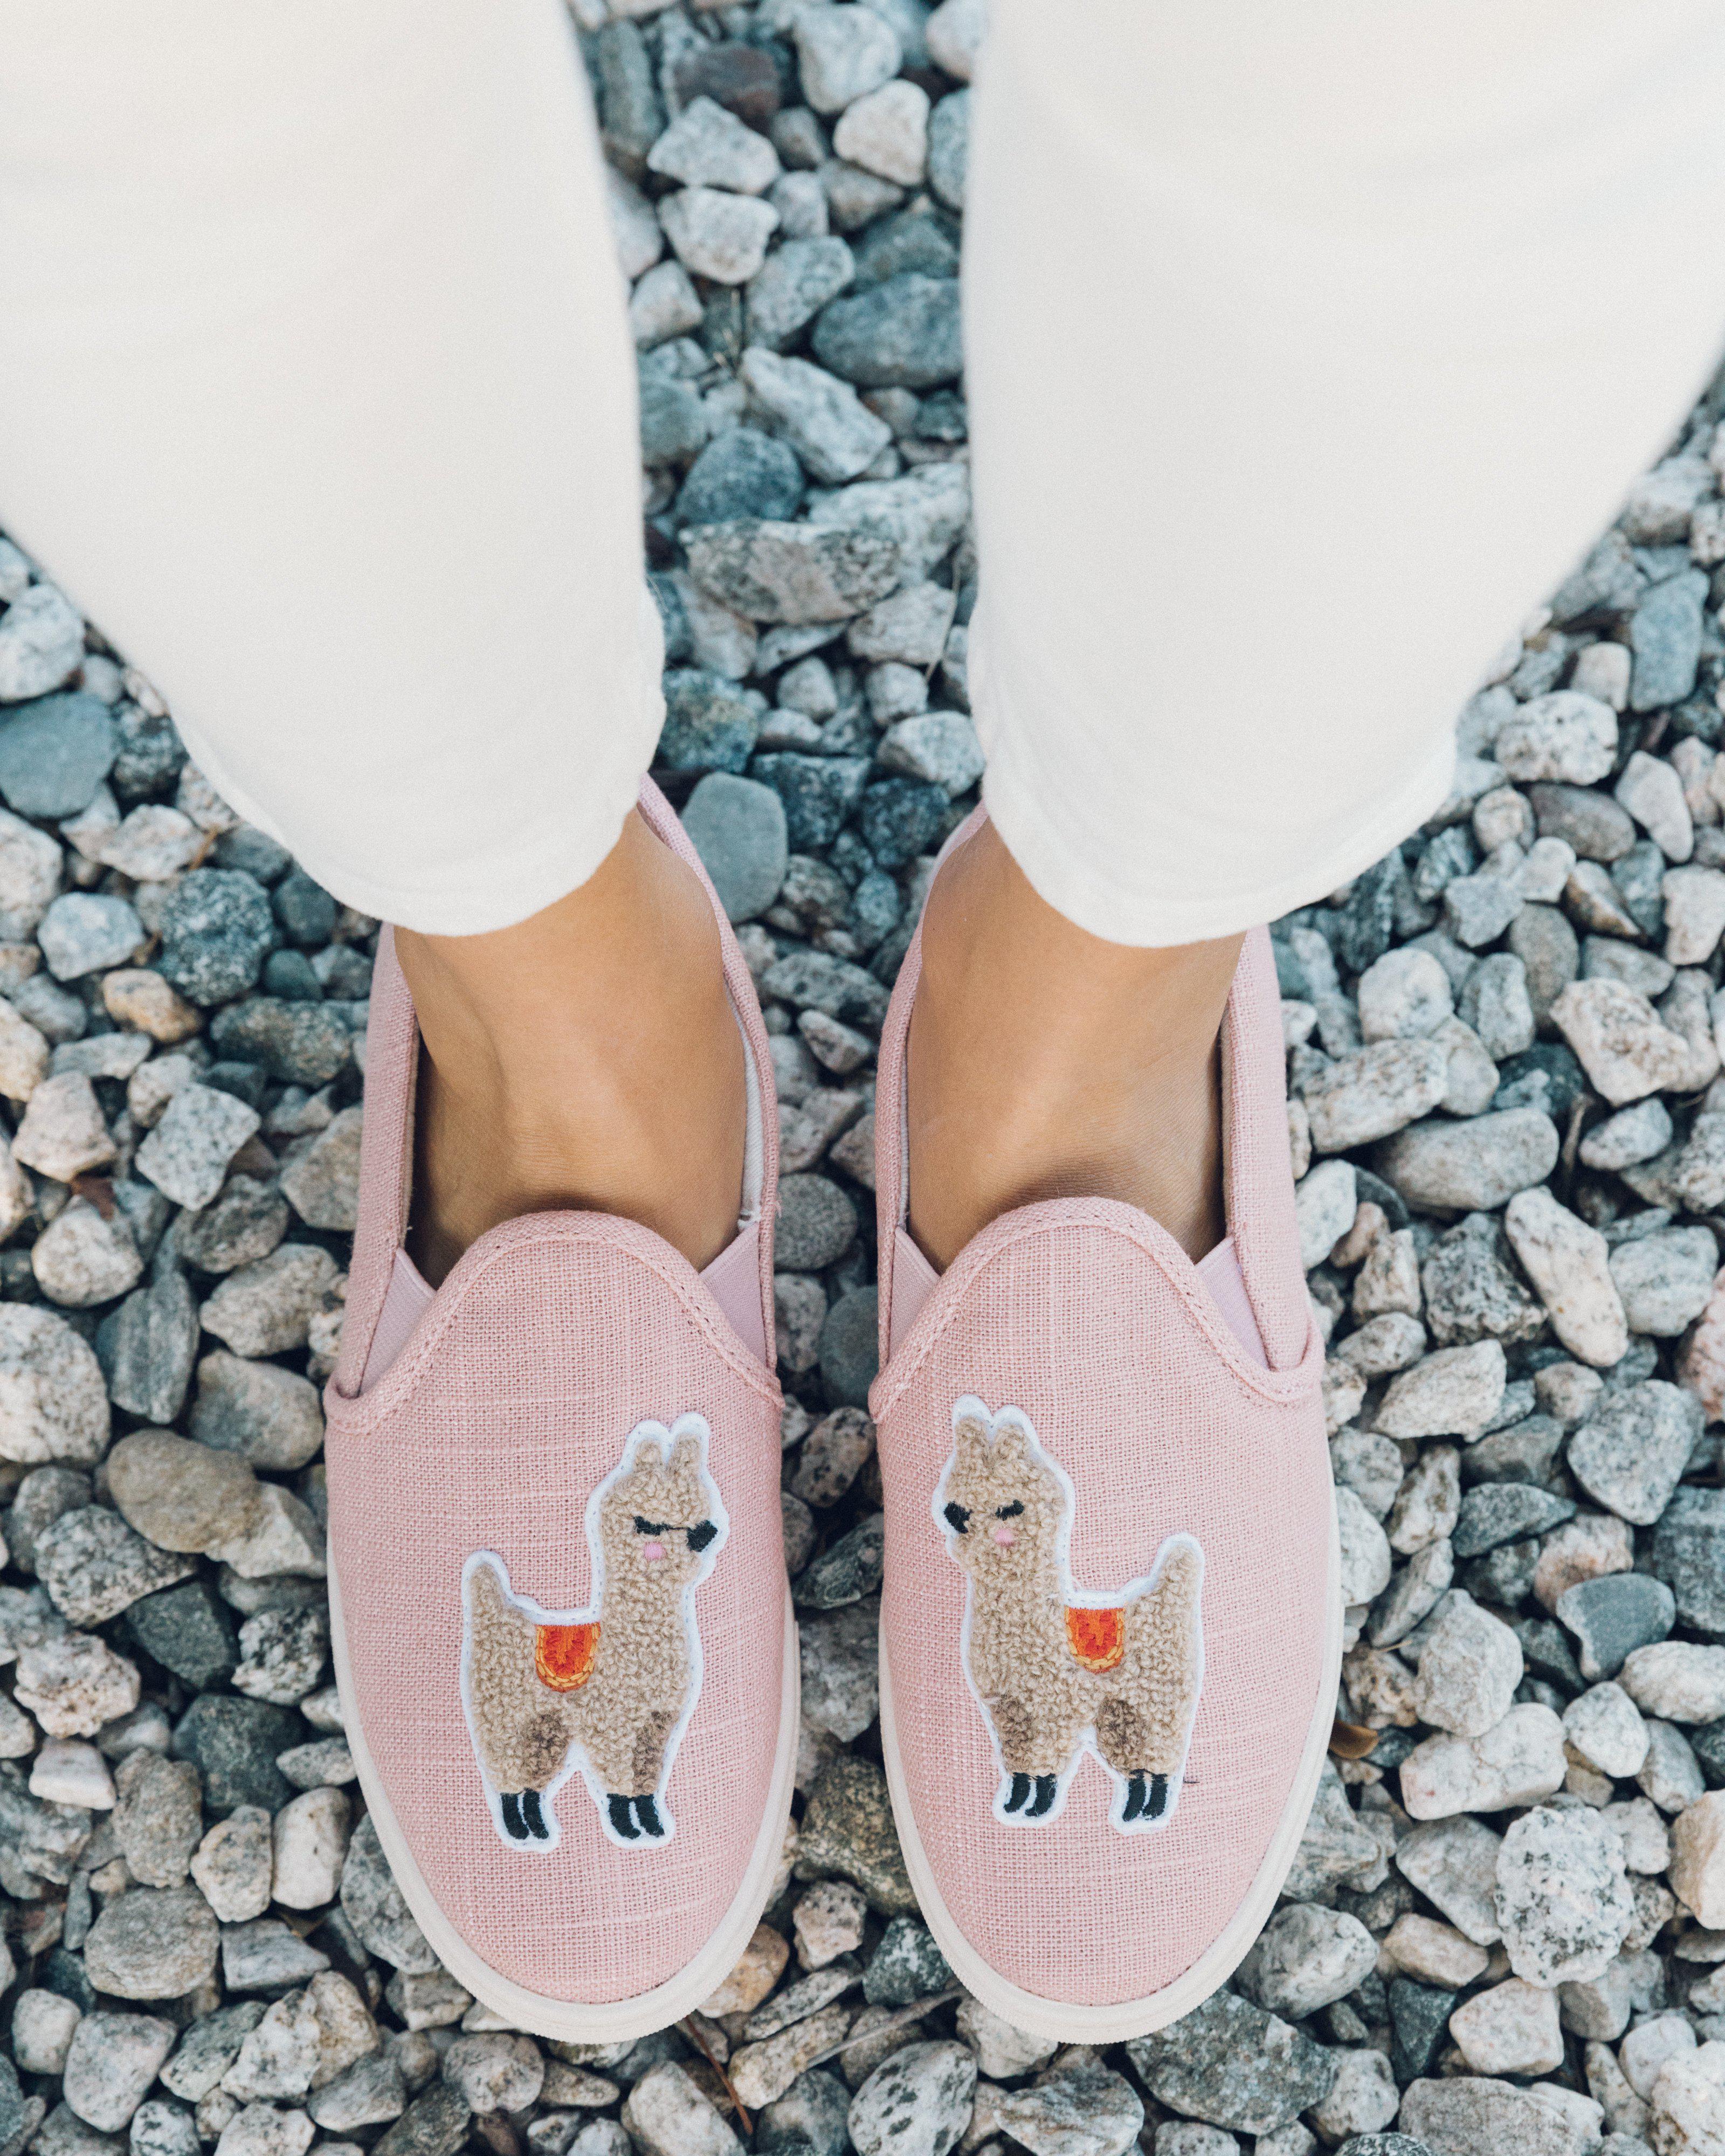 Soludos Llama Slip-on Sneaker - Lyst